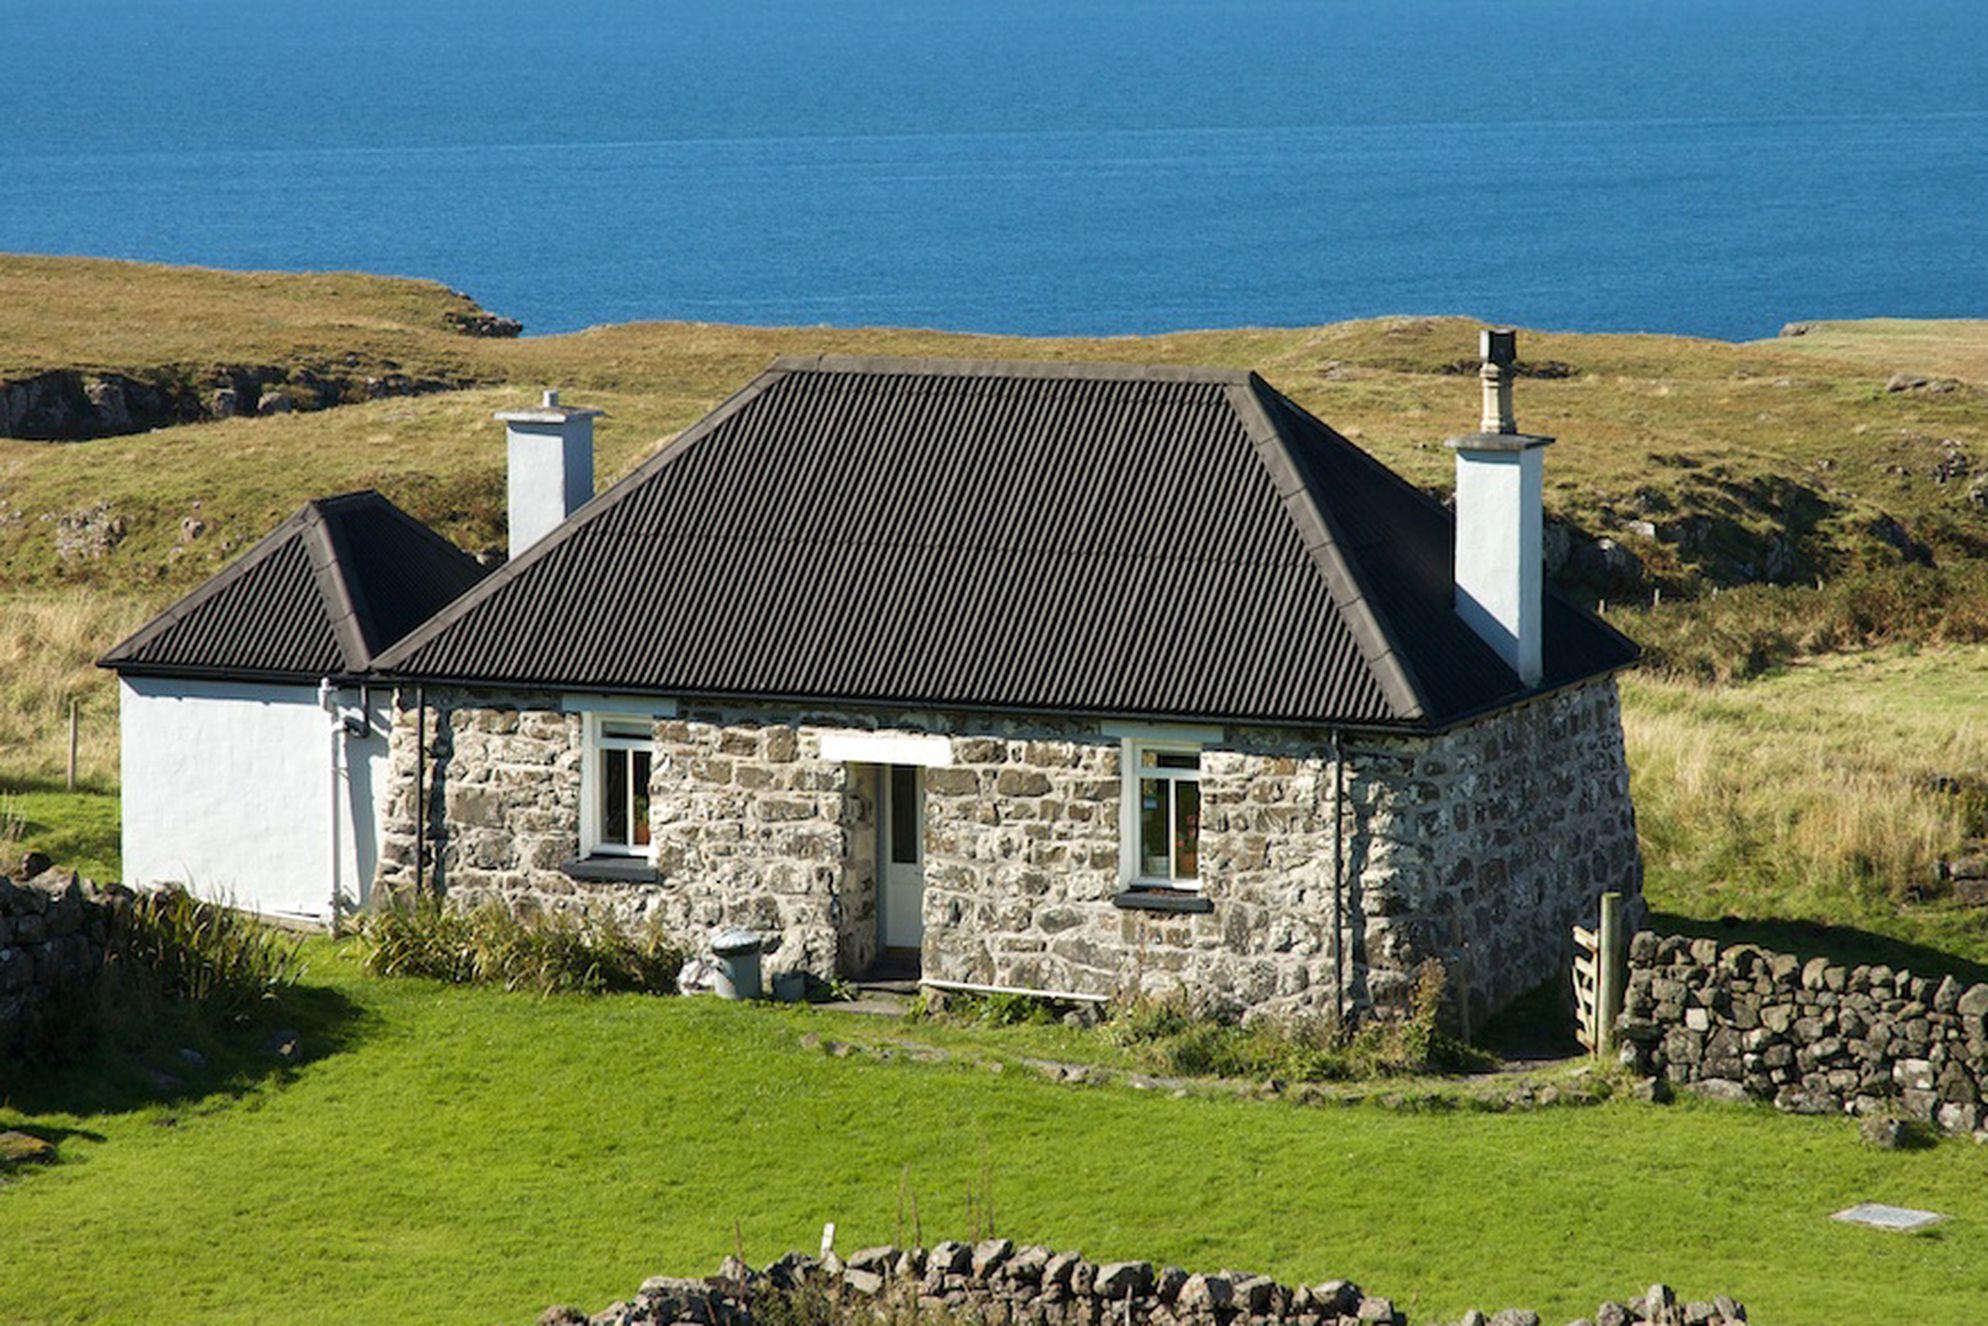 Exterior of Treshnish Farm in Scotland overlooking the sea